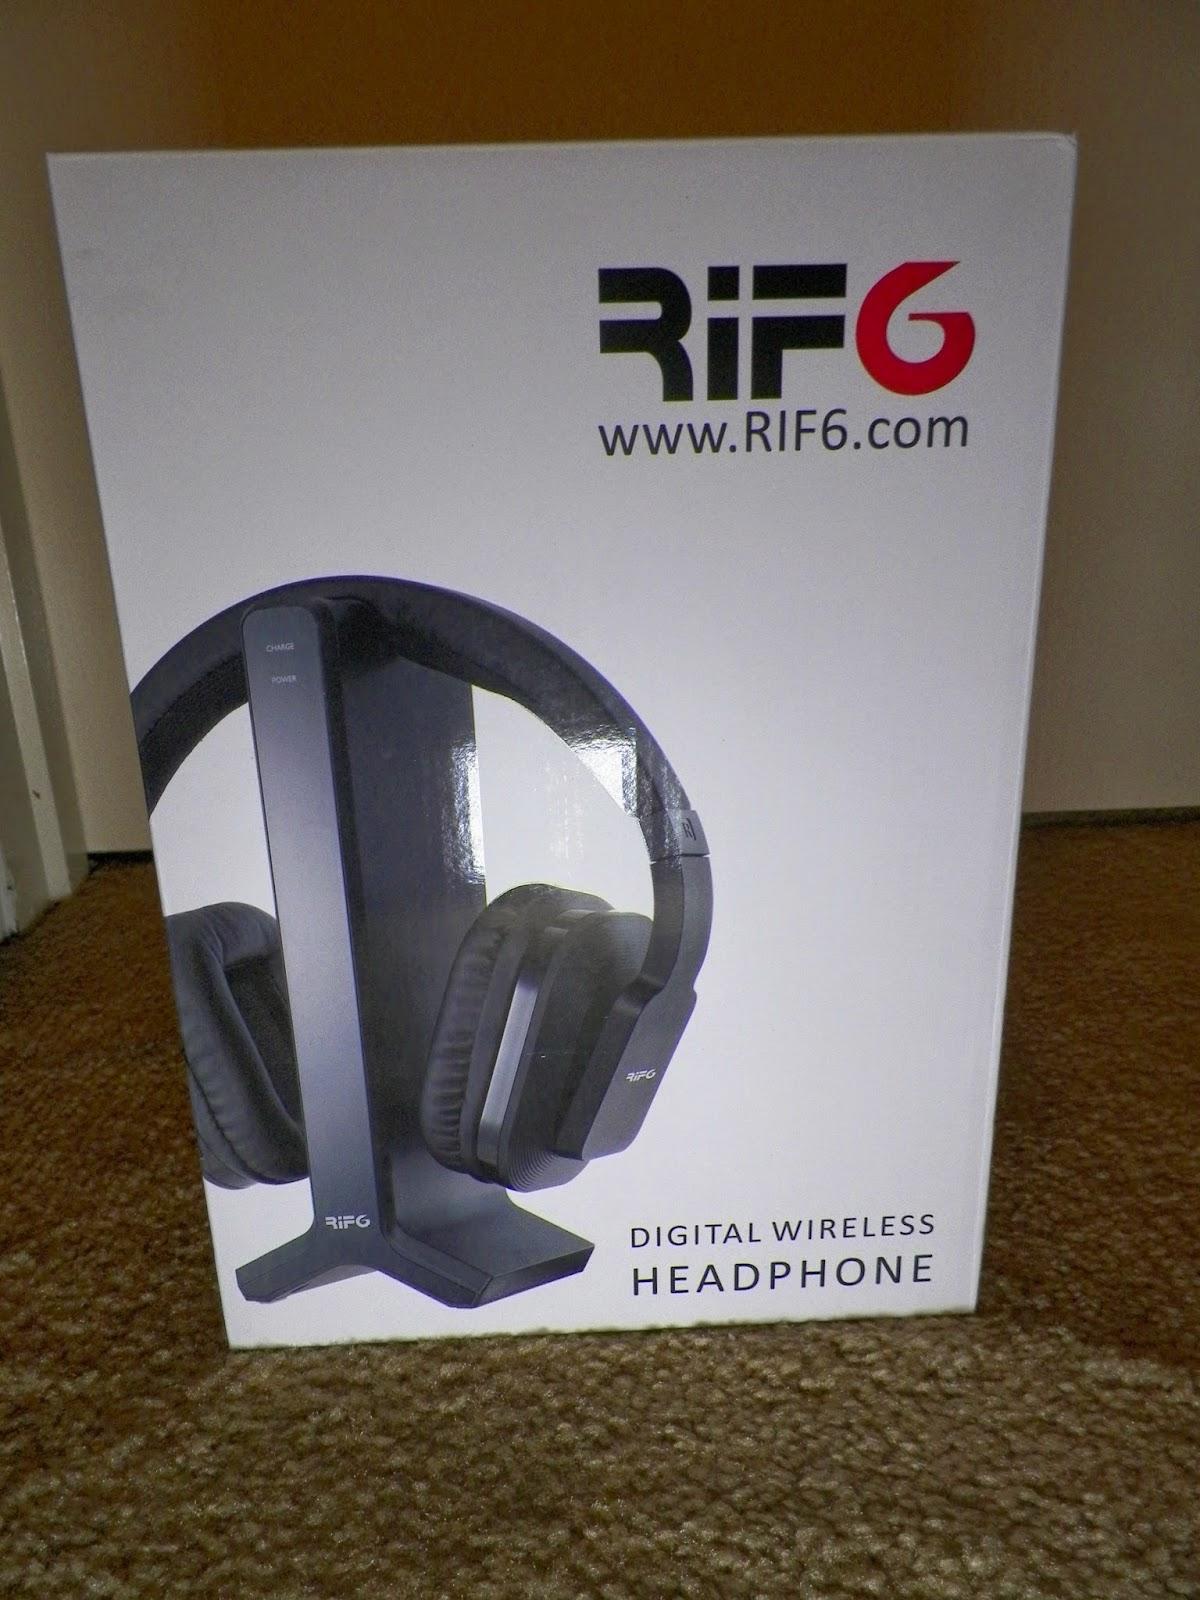 Rif6DigitalWirelessHeadphones.jpg